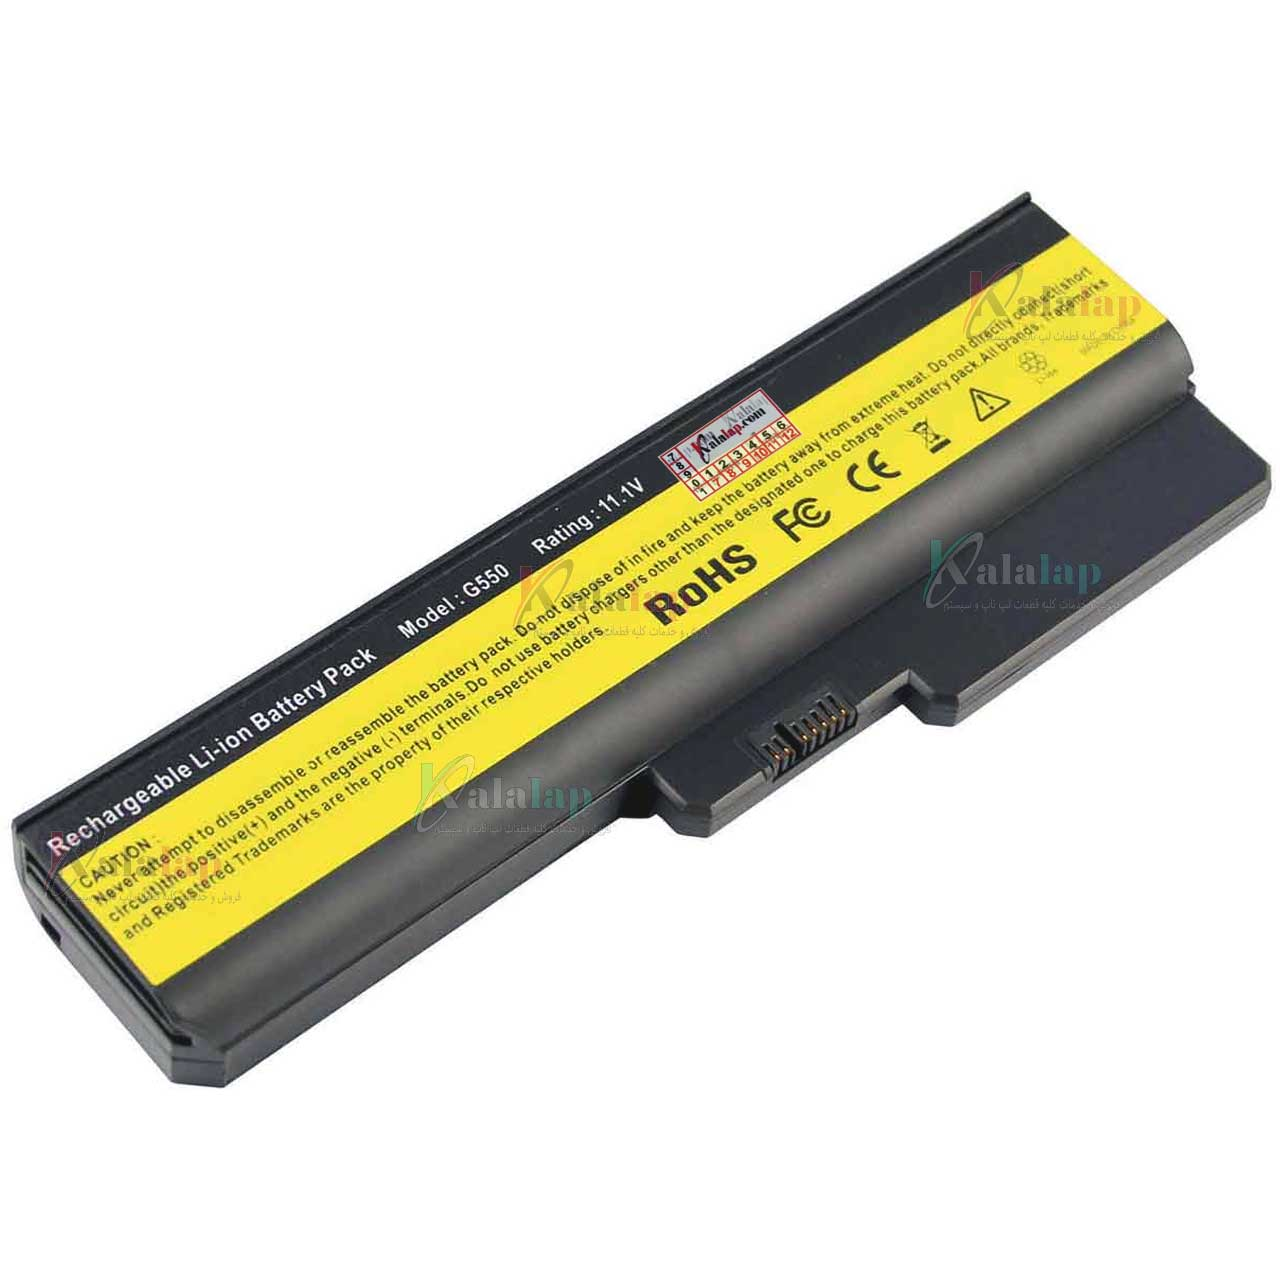 باتری لپ تاپ لنوو Ideapad G530 G550 N500 G430